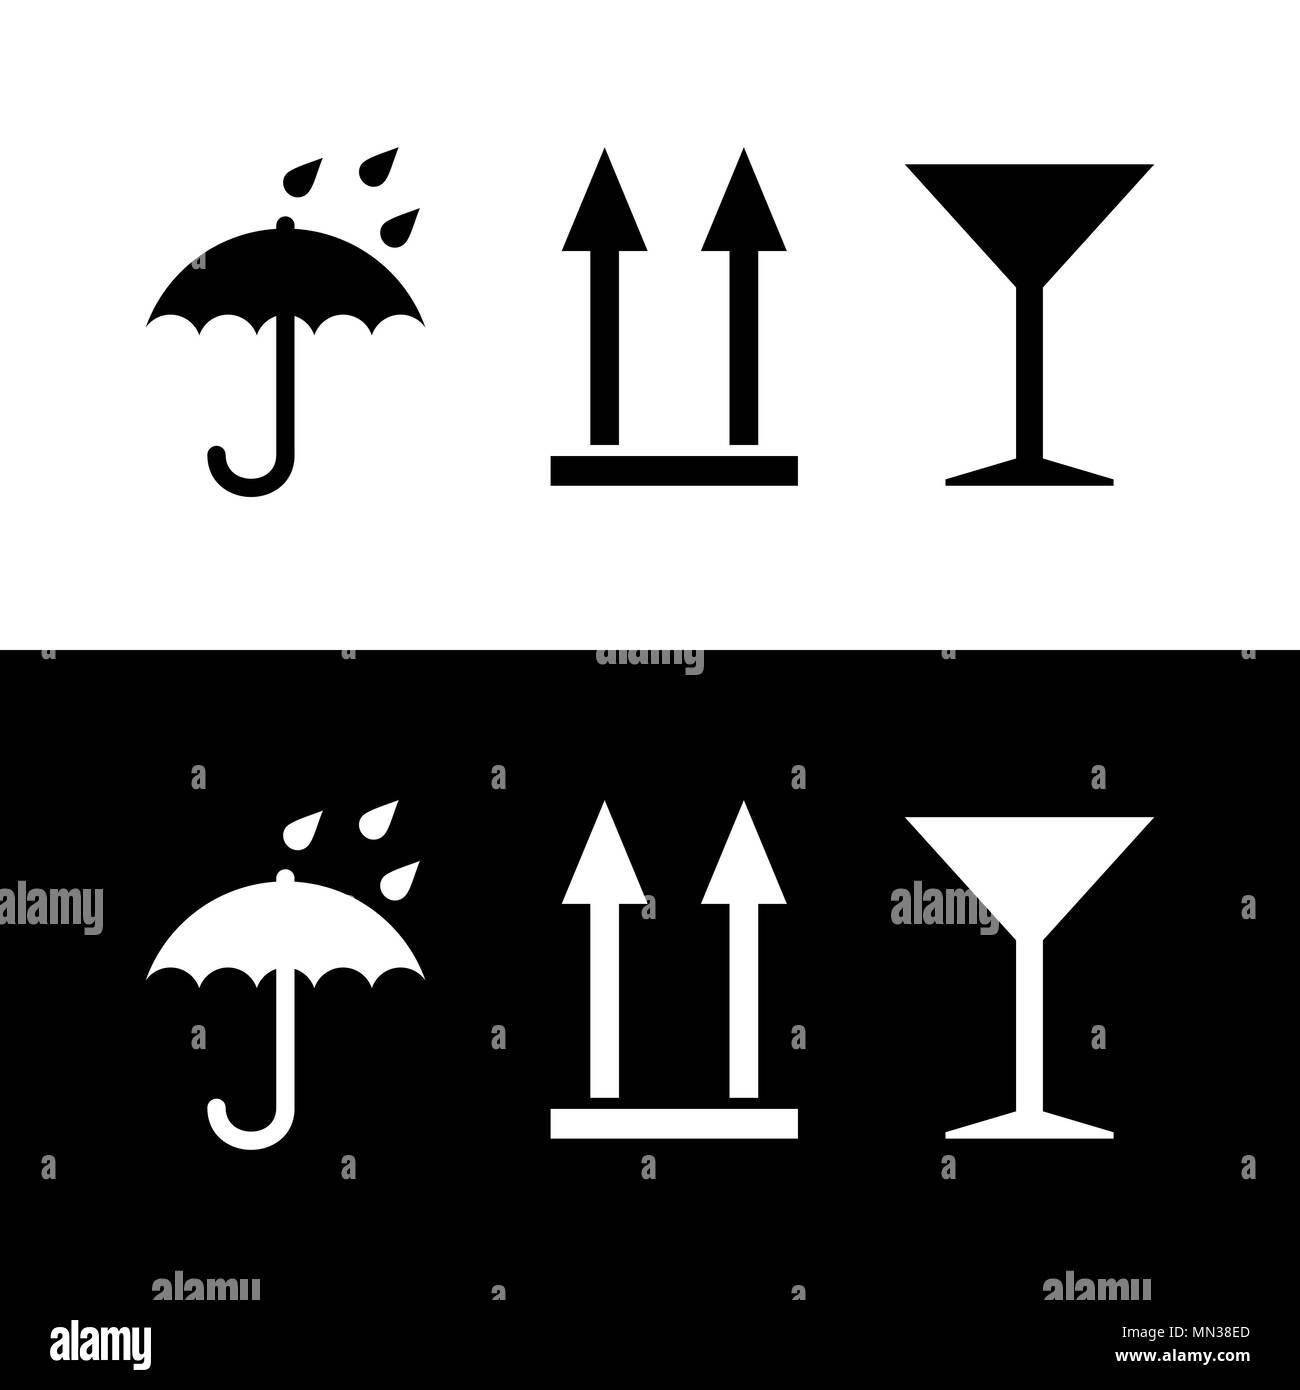 Pictogram umbrella, martini glass, arrows up in white and black colors - Stock Vector